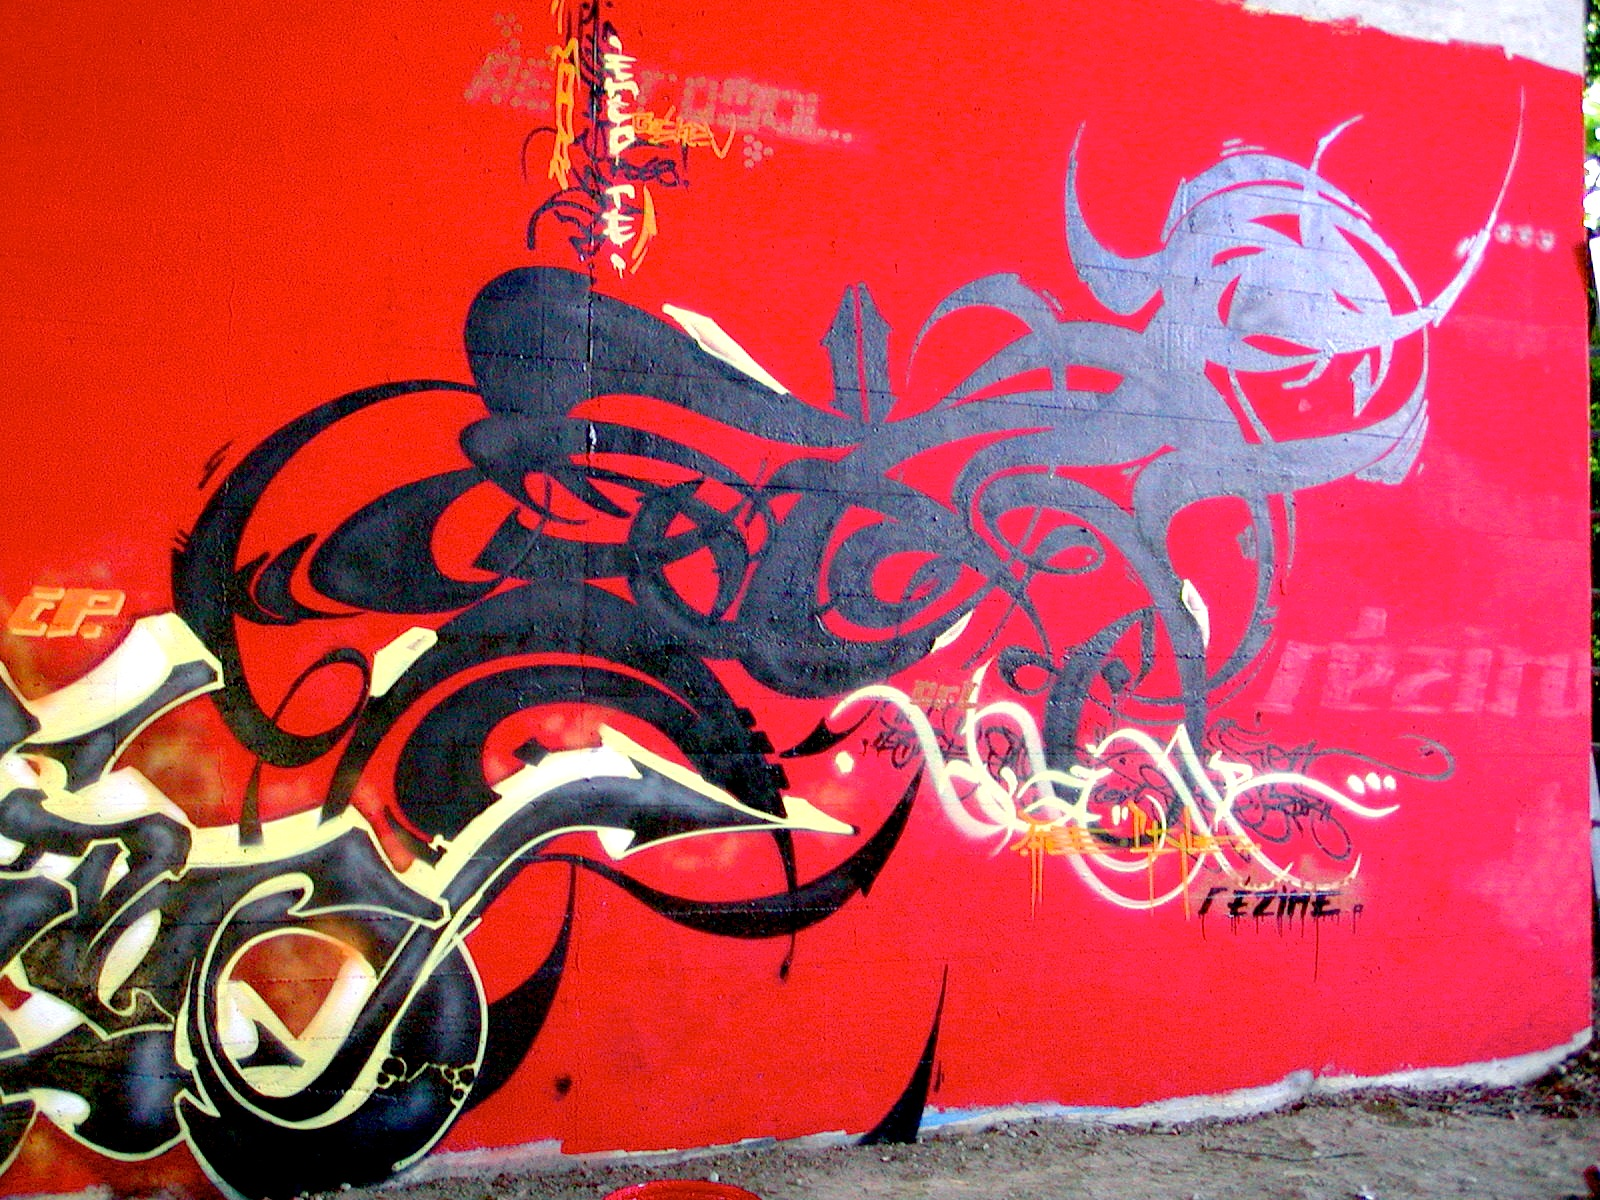 Kaligraffiti